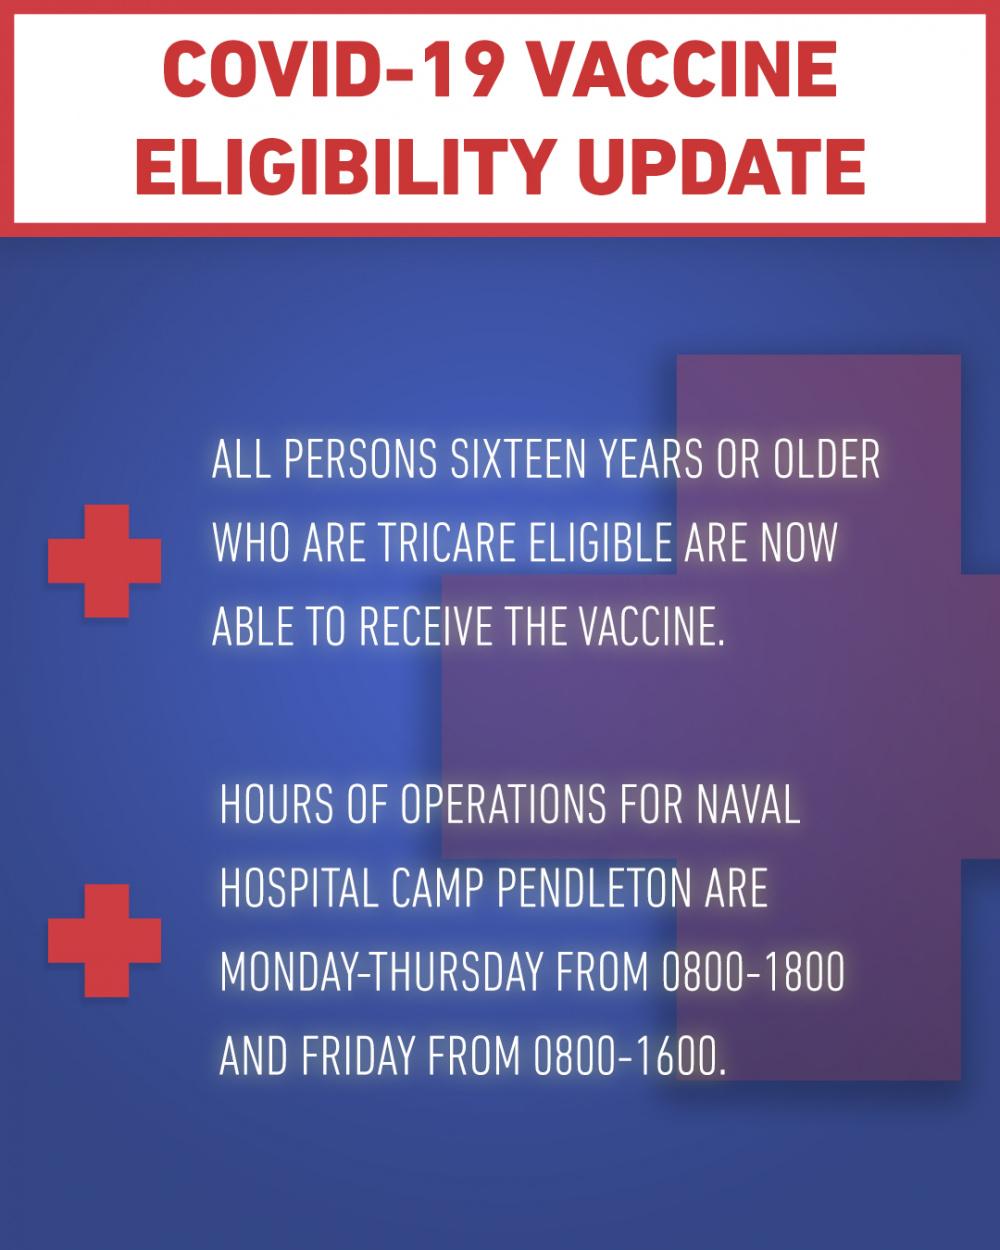 COVID-19 Vaccine Eligibility Update